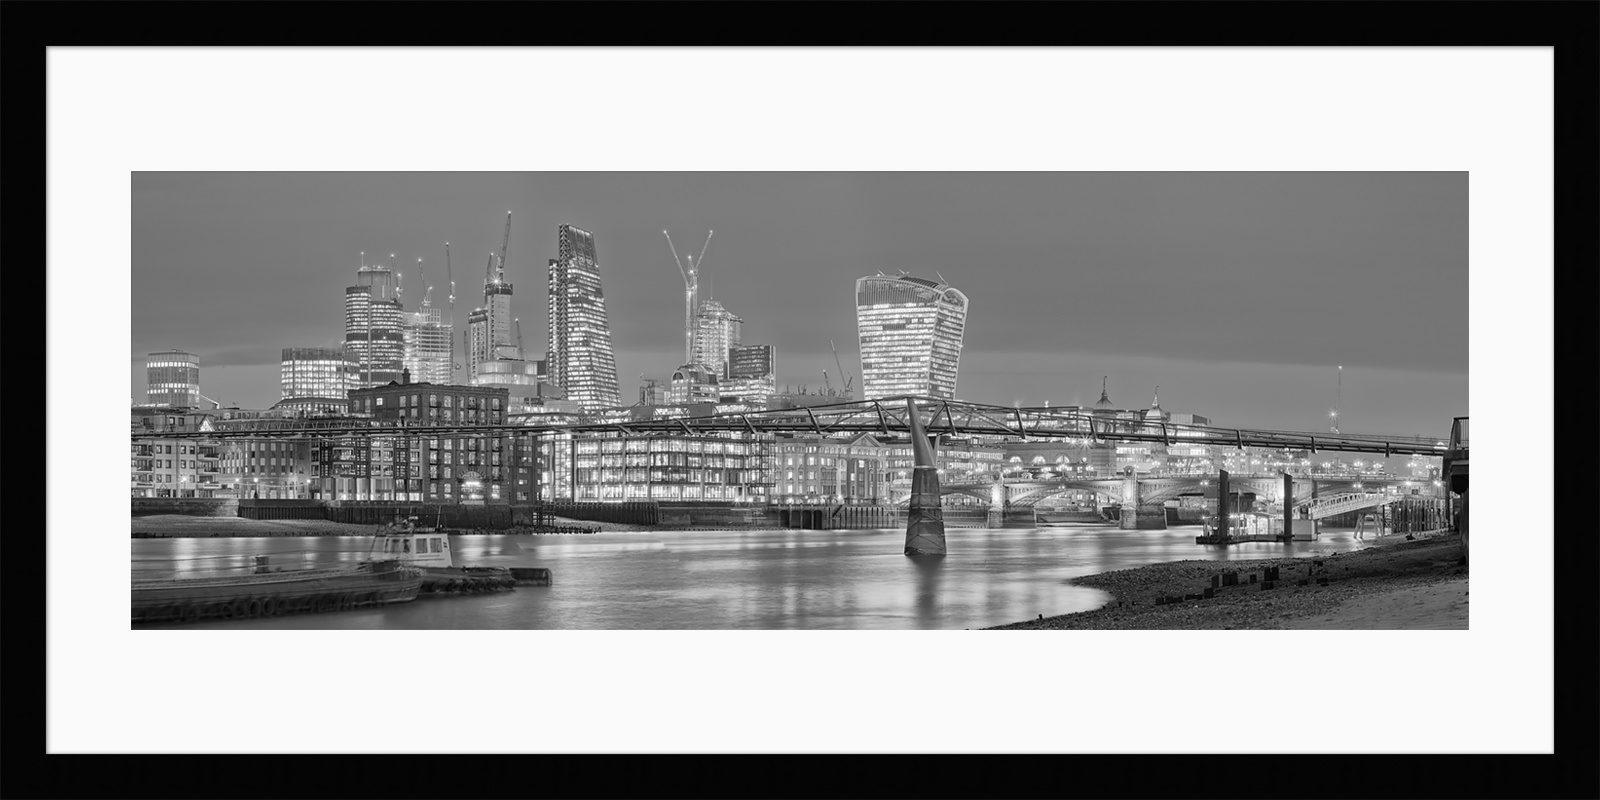 Low Tide at Millennium Bridge - Framed Fine Art Print